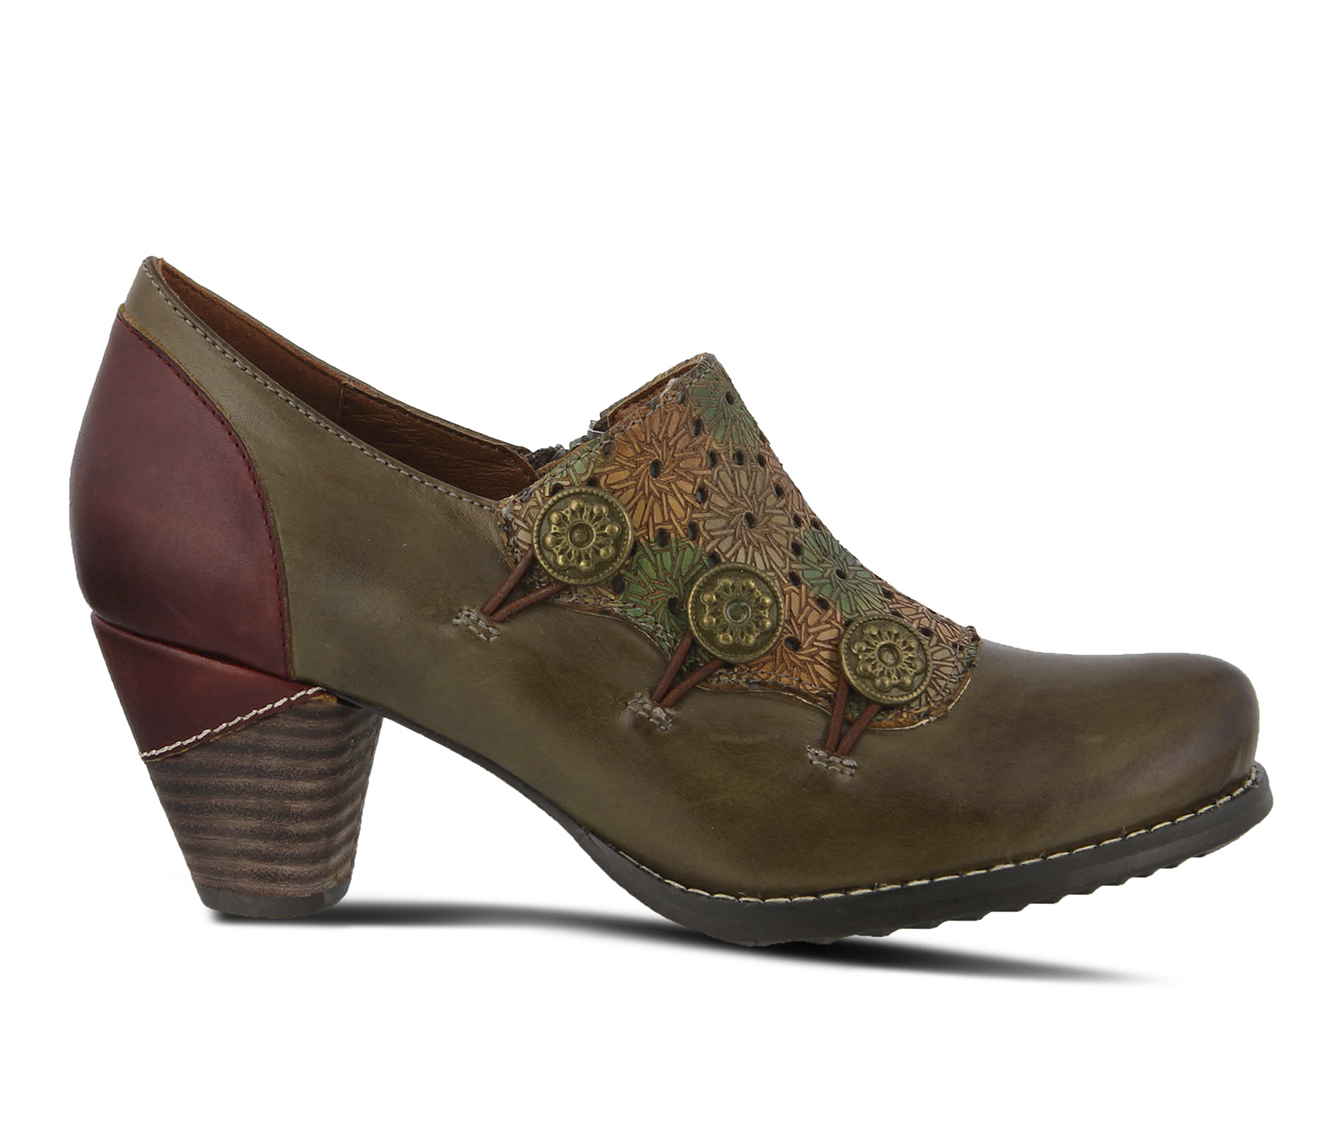 L'Artiste Kantia Women's Dress Shoe (Green Leather)